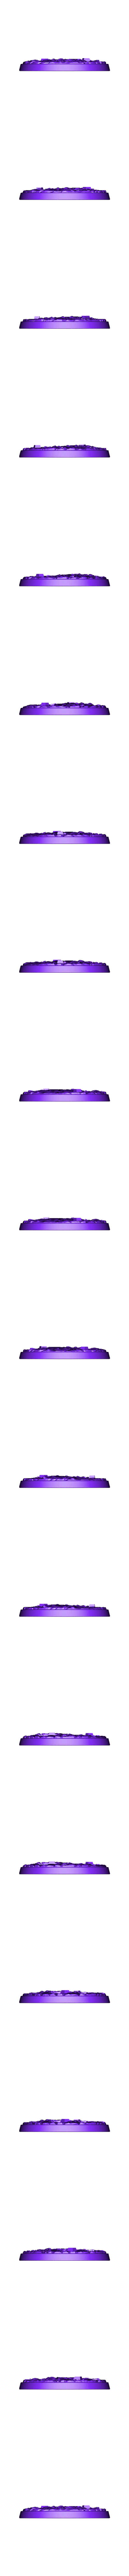 Werewolf_Olcan_Base.stl Télécharger fichier STL Olcan le Sage • Objet imprimable en 3D, White_Werewolf_Tavern